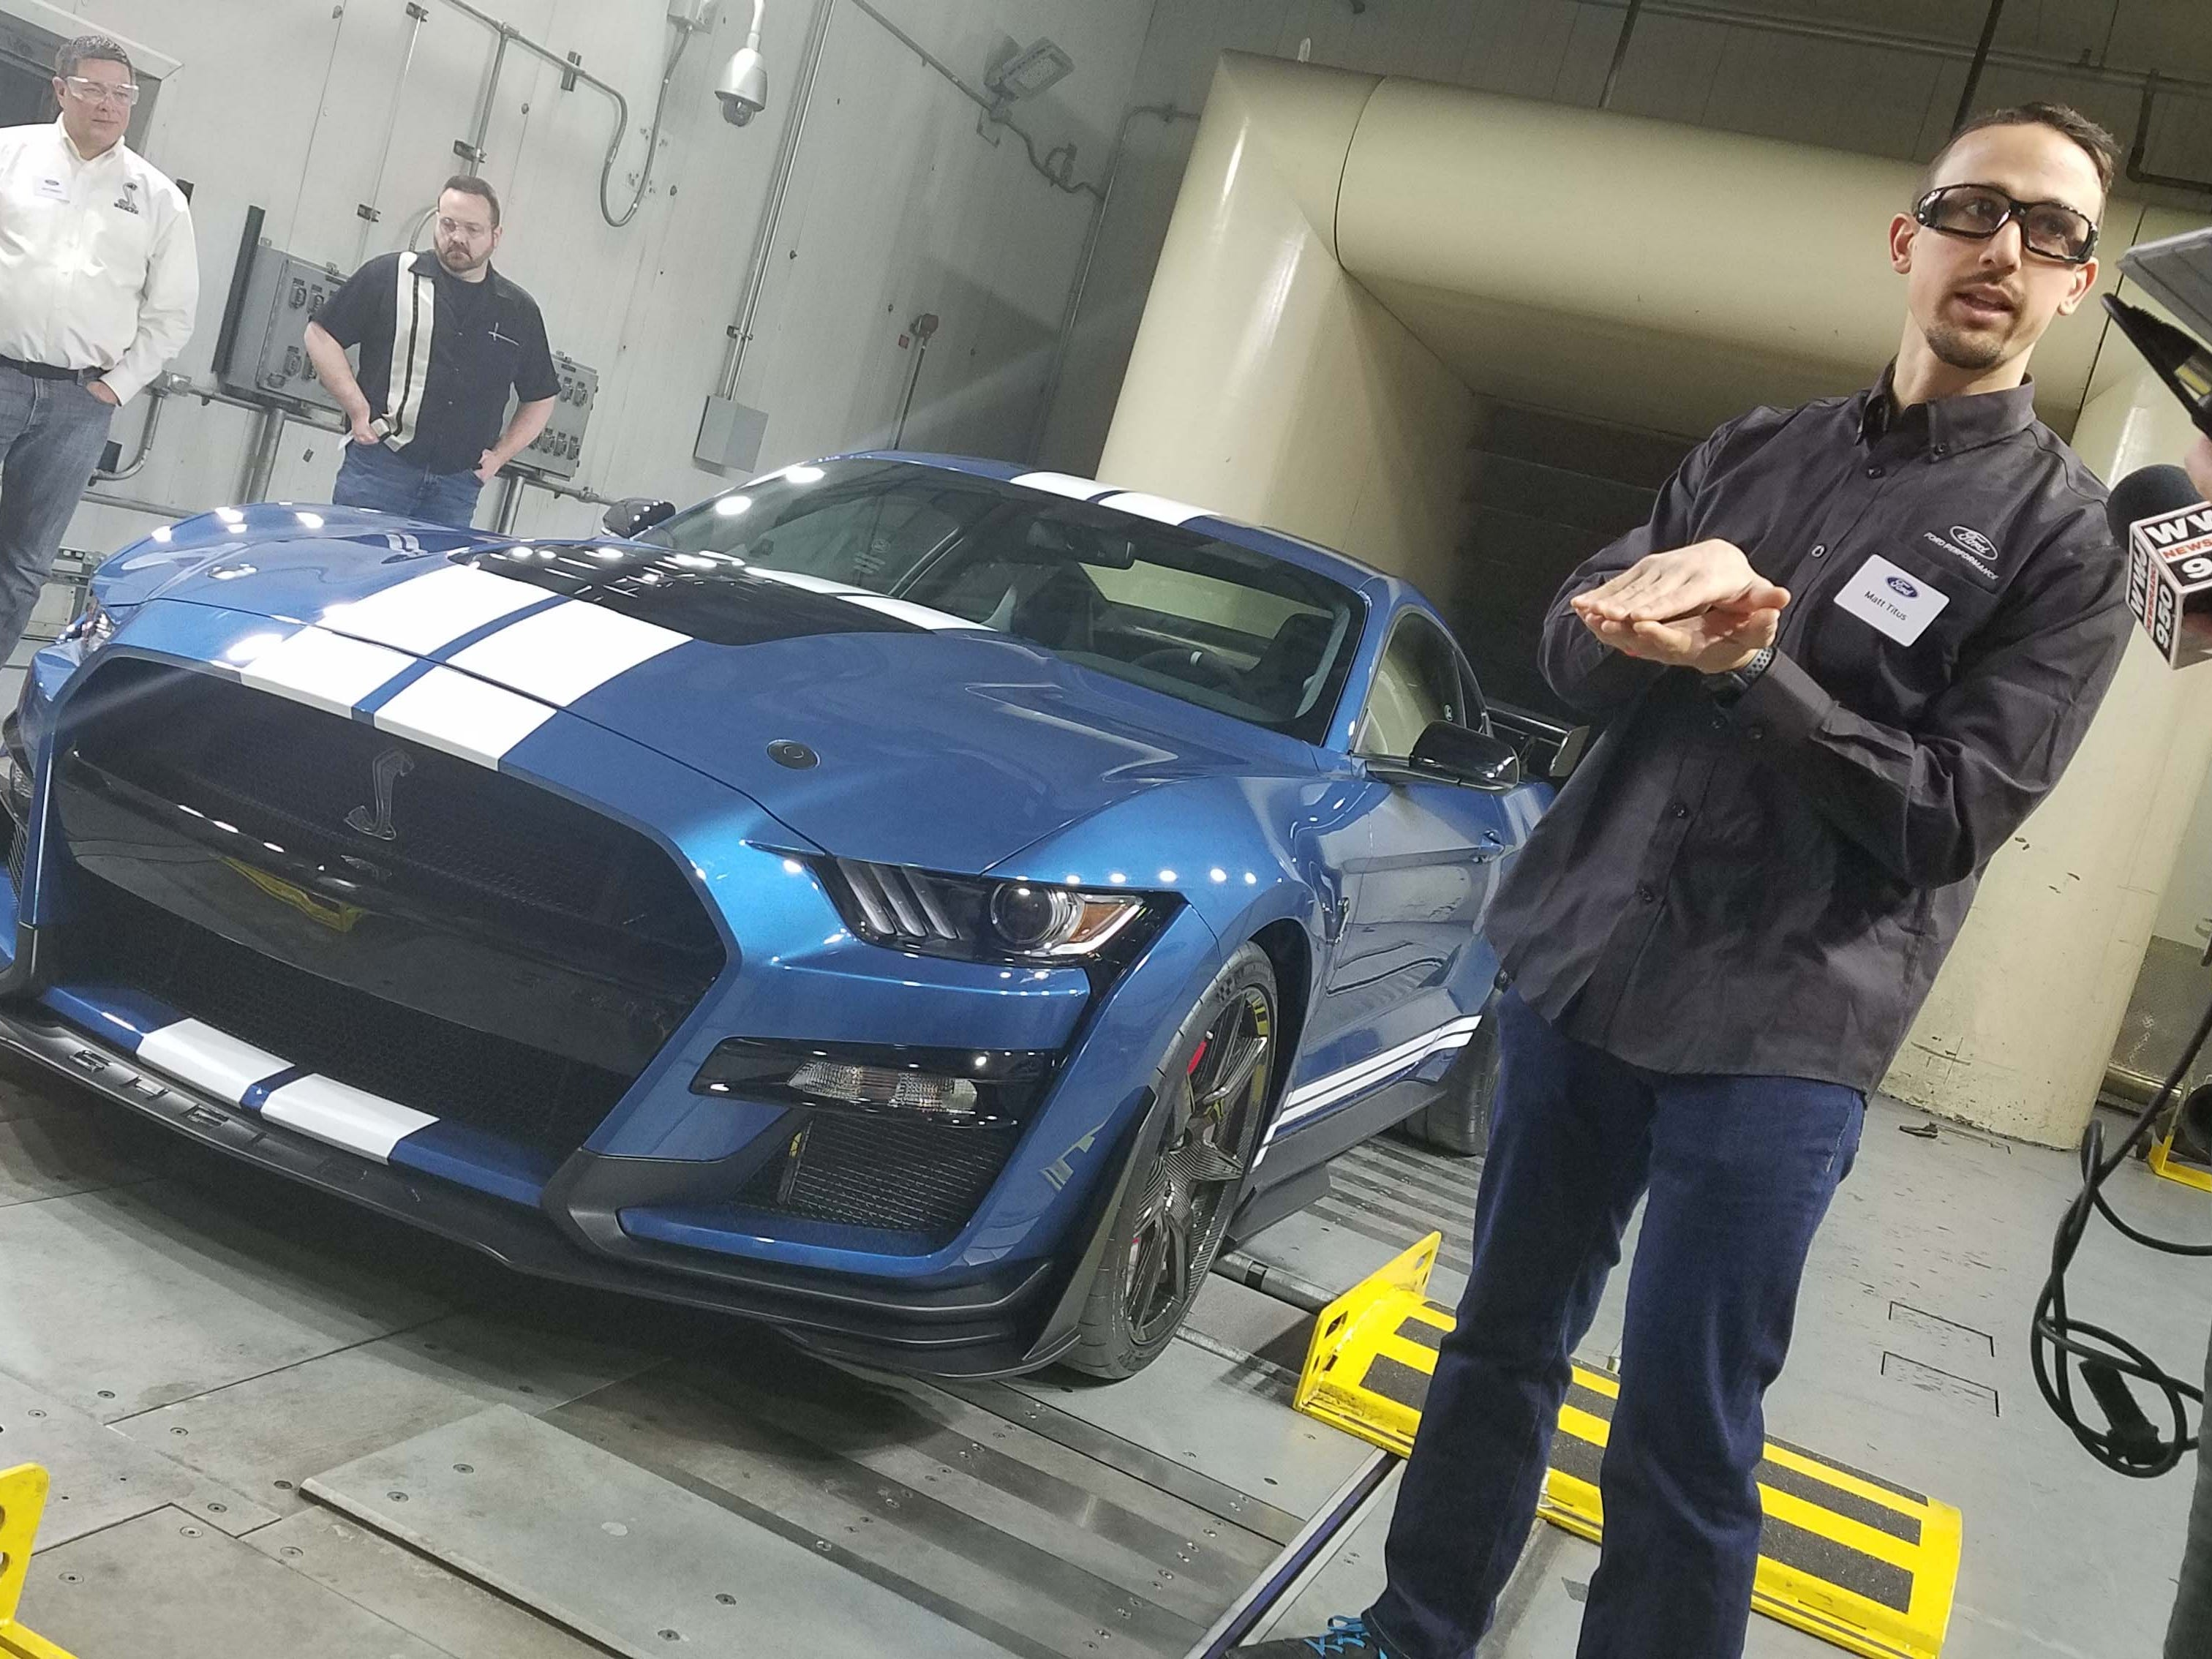 In Ford's Allen Park wind tunnel, aero engineer Matt Titus explains the details of fluid dynamics.